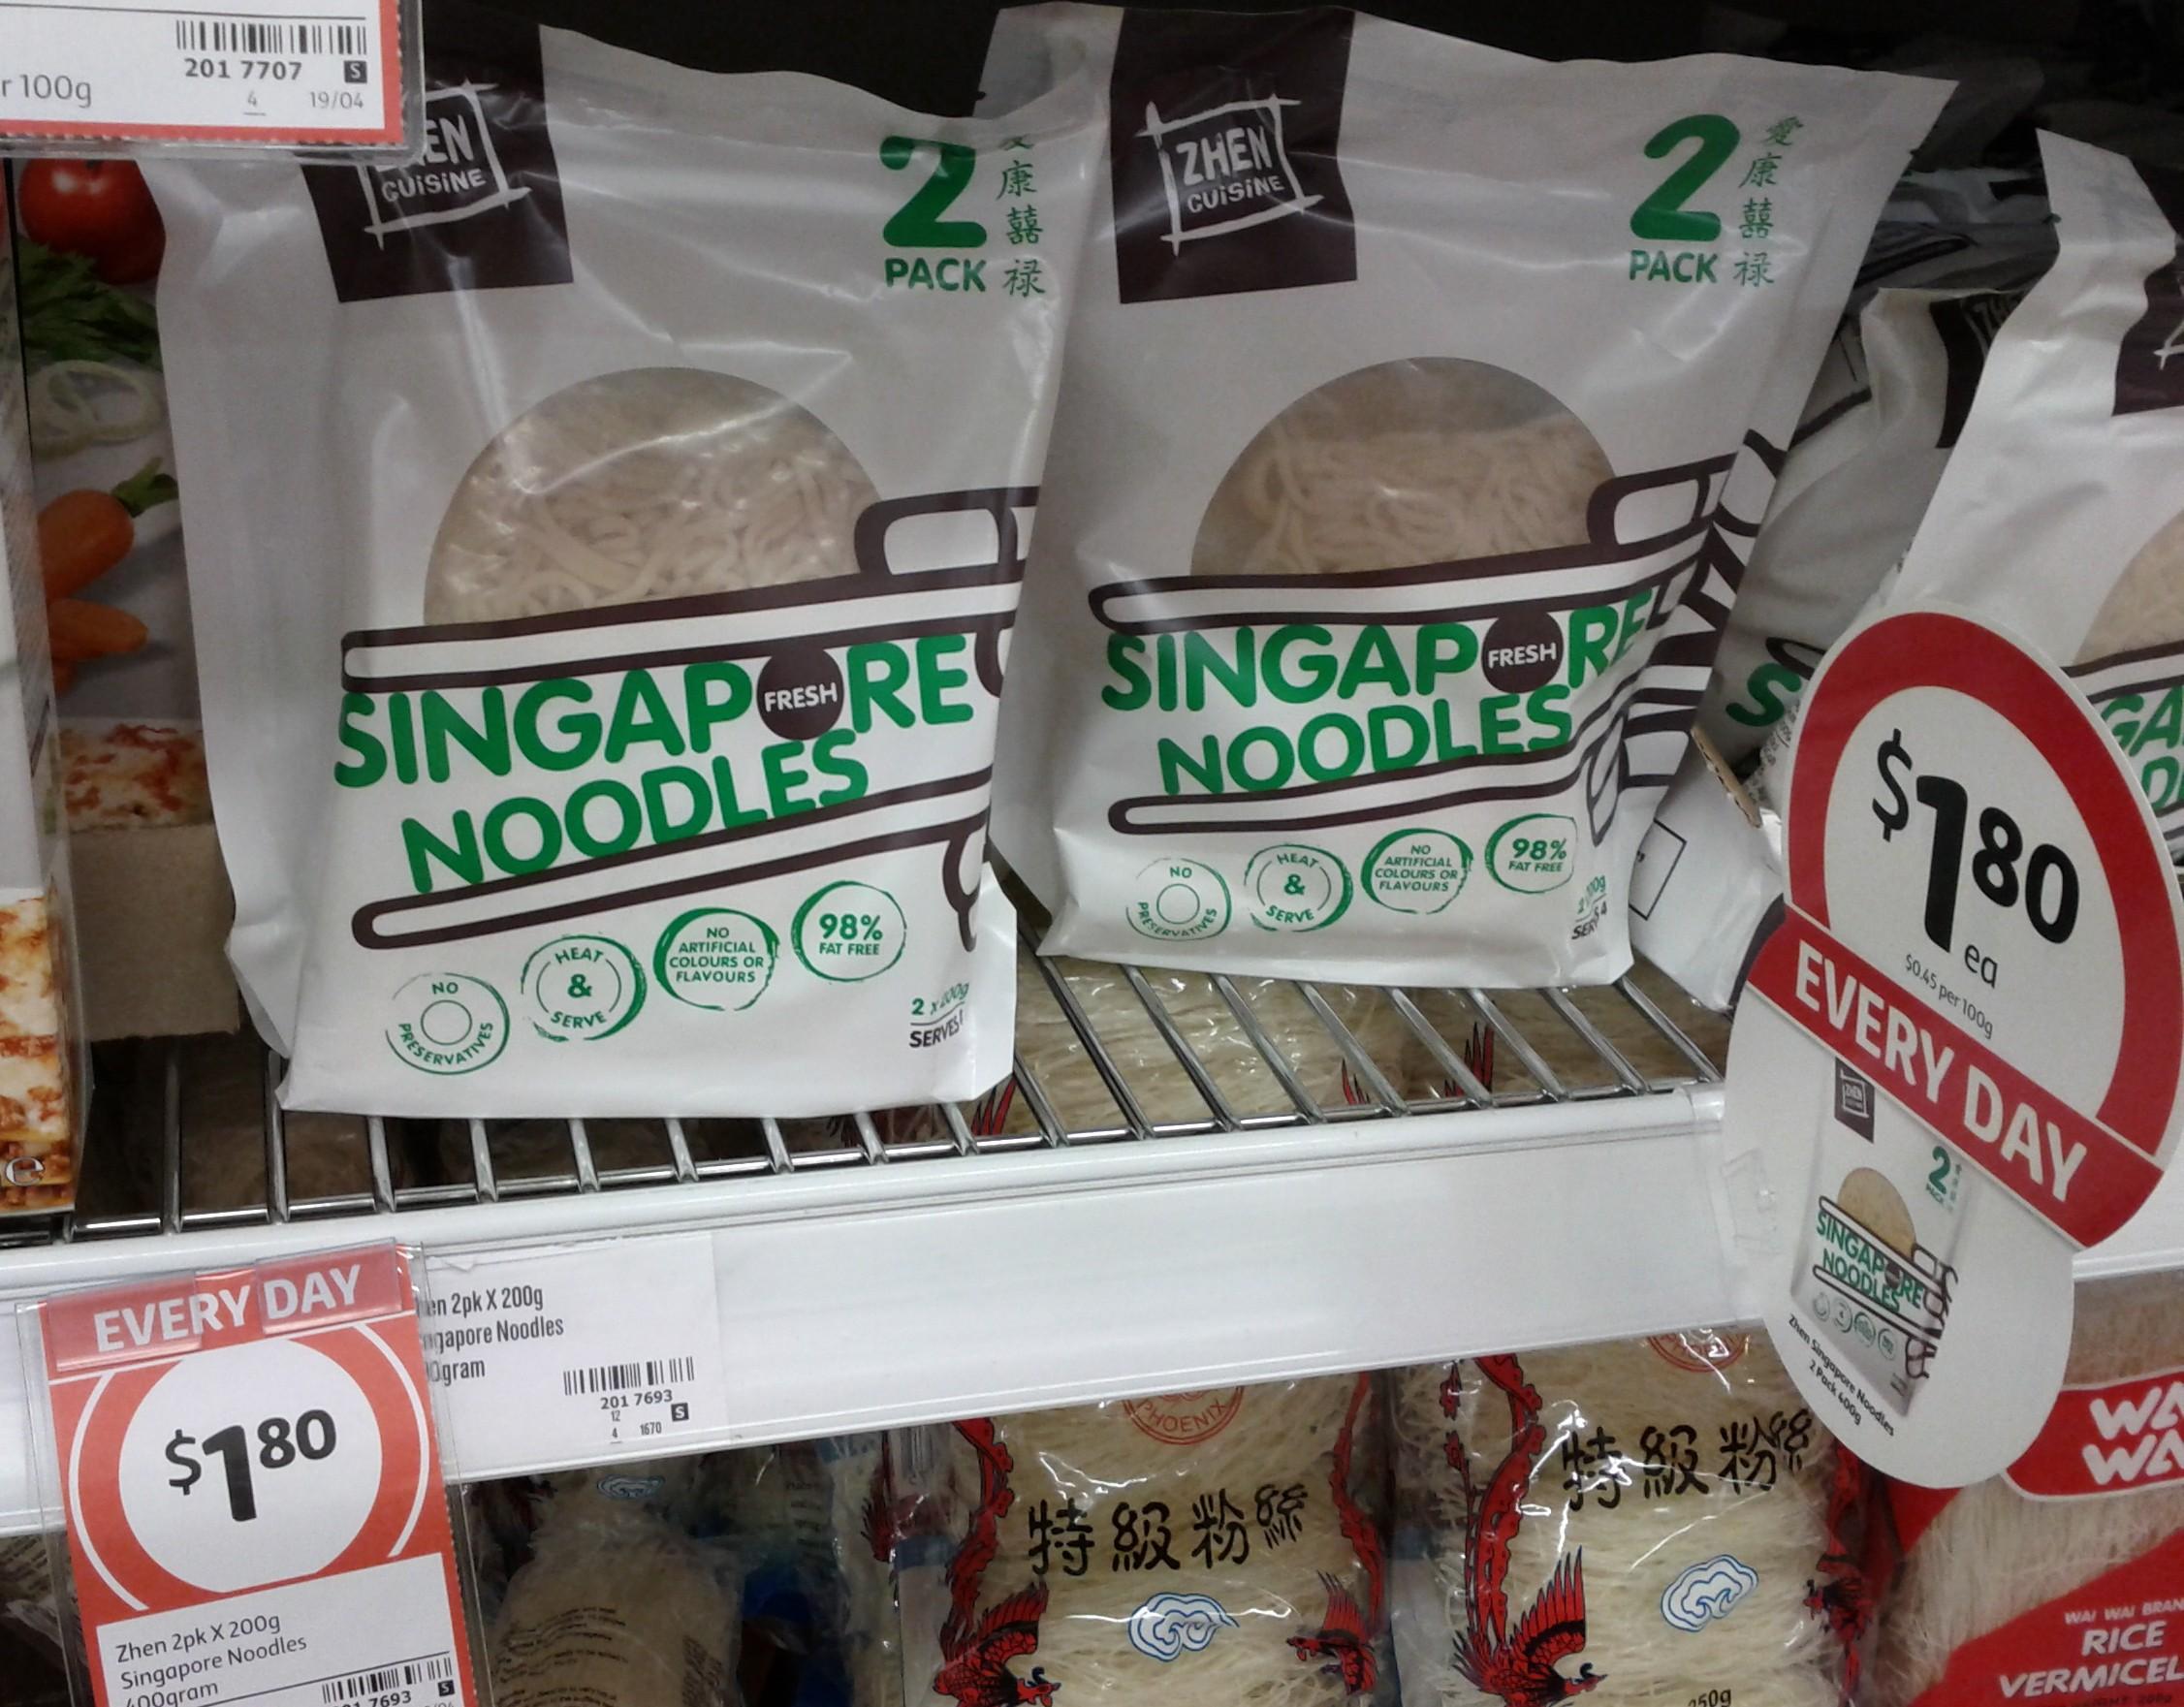 Zhen 2x200g Singapore Noodles